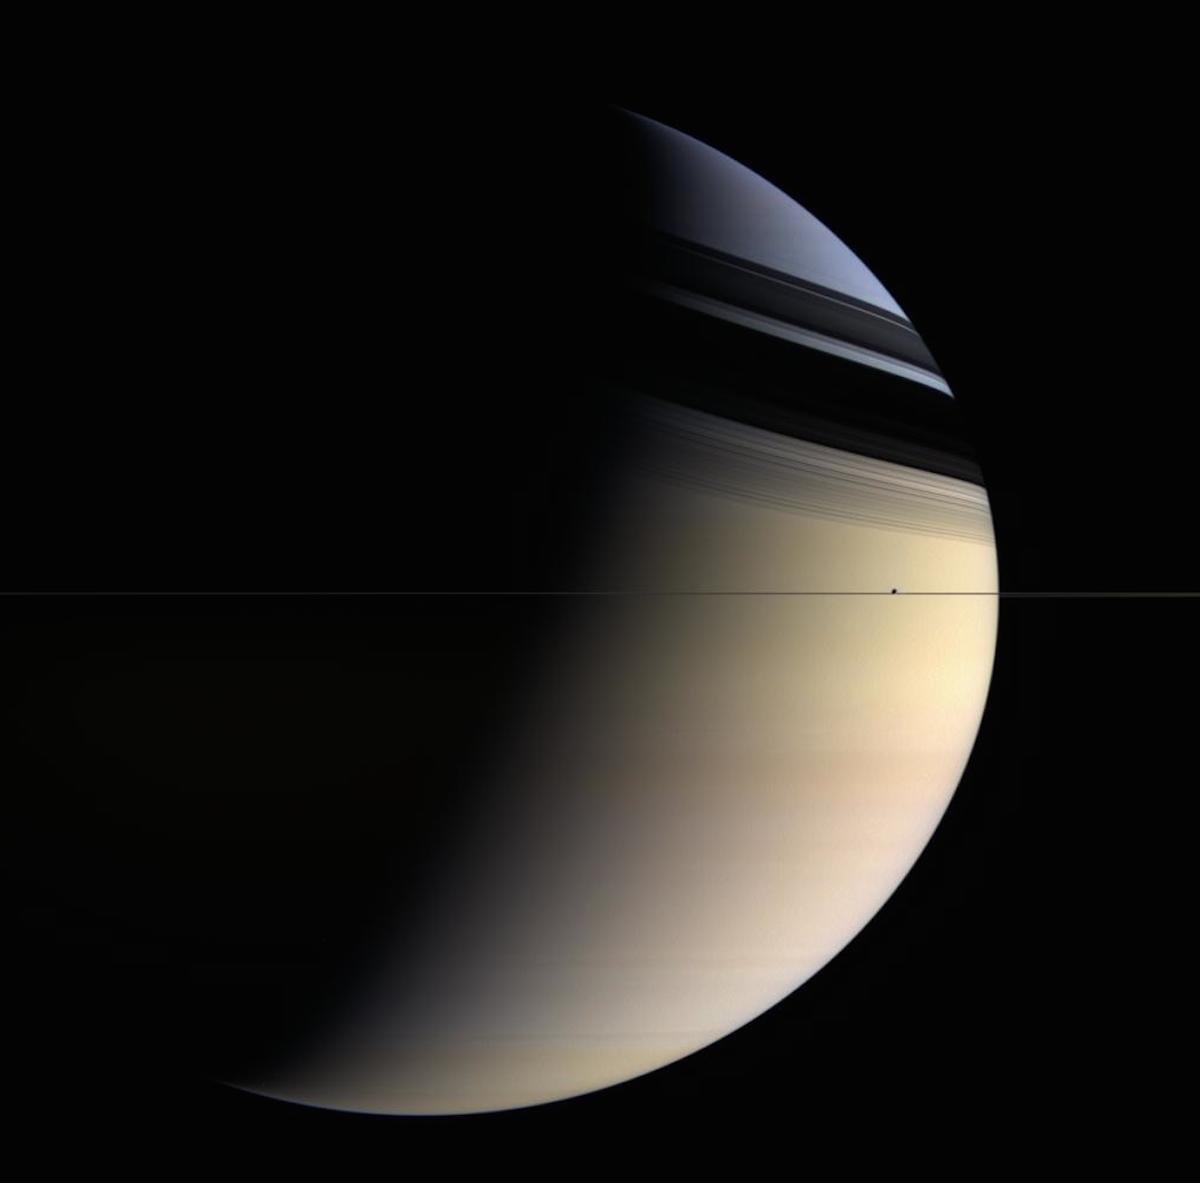 imagenes nunca vistas de saturno tomadas por la sonda cassini 14